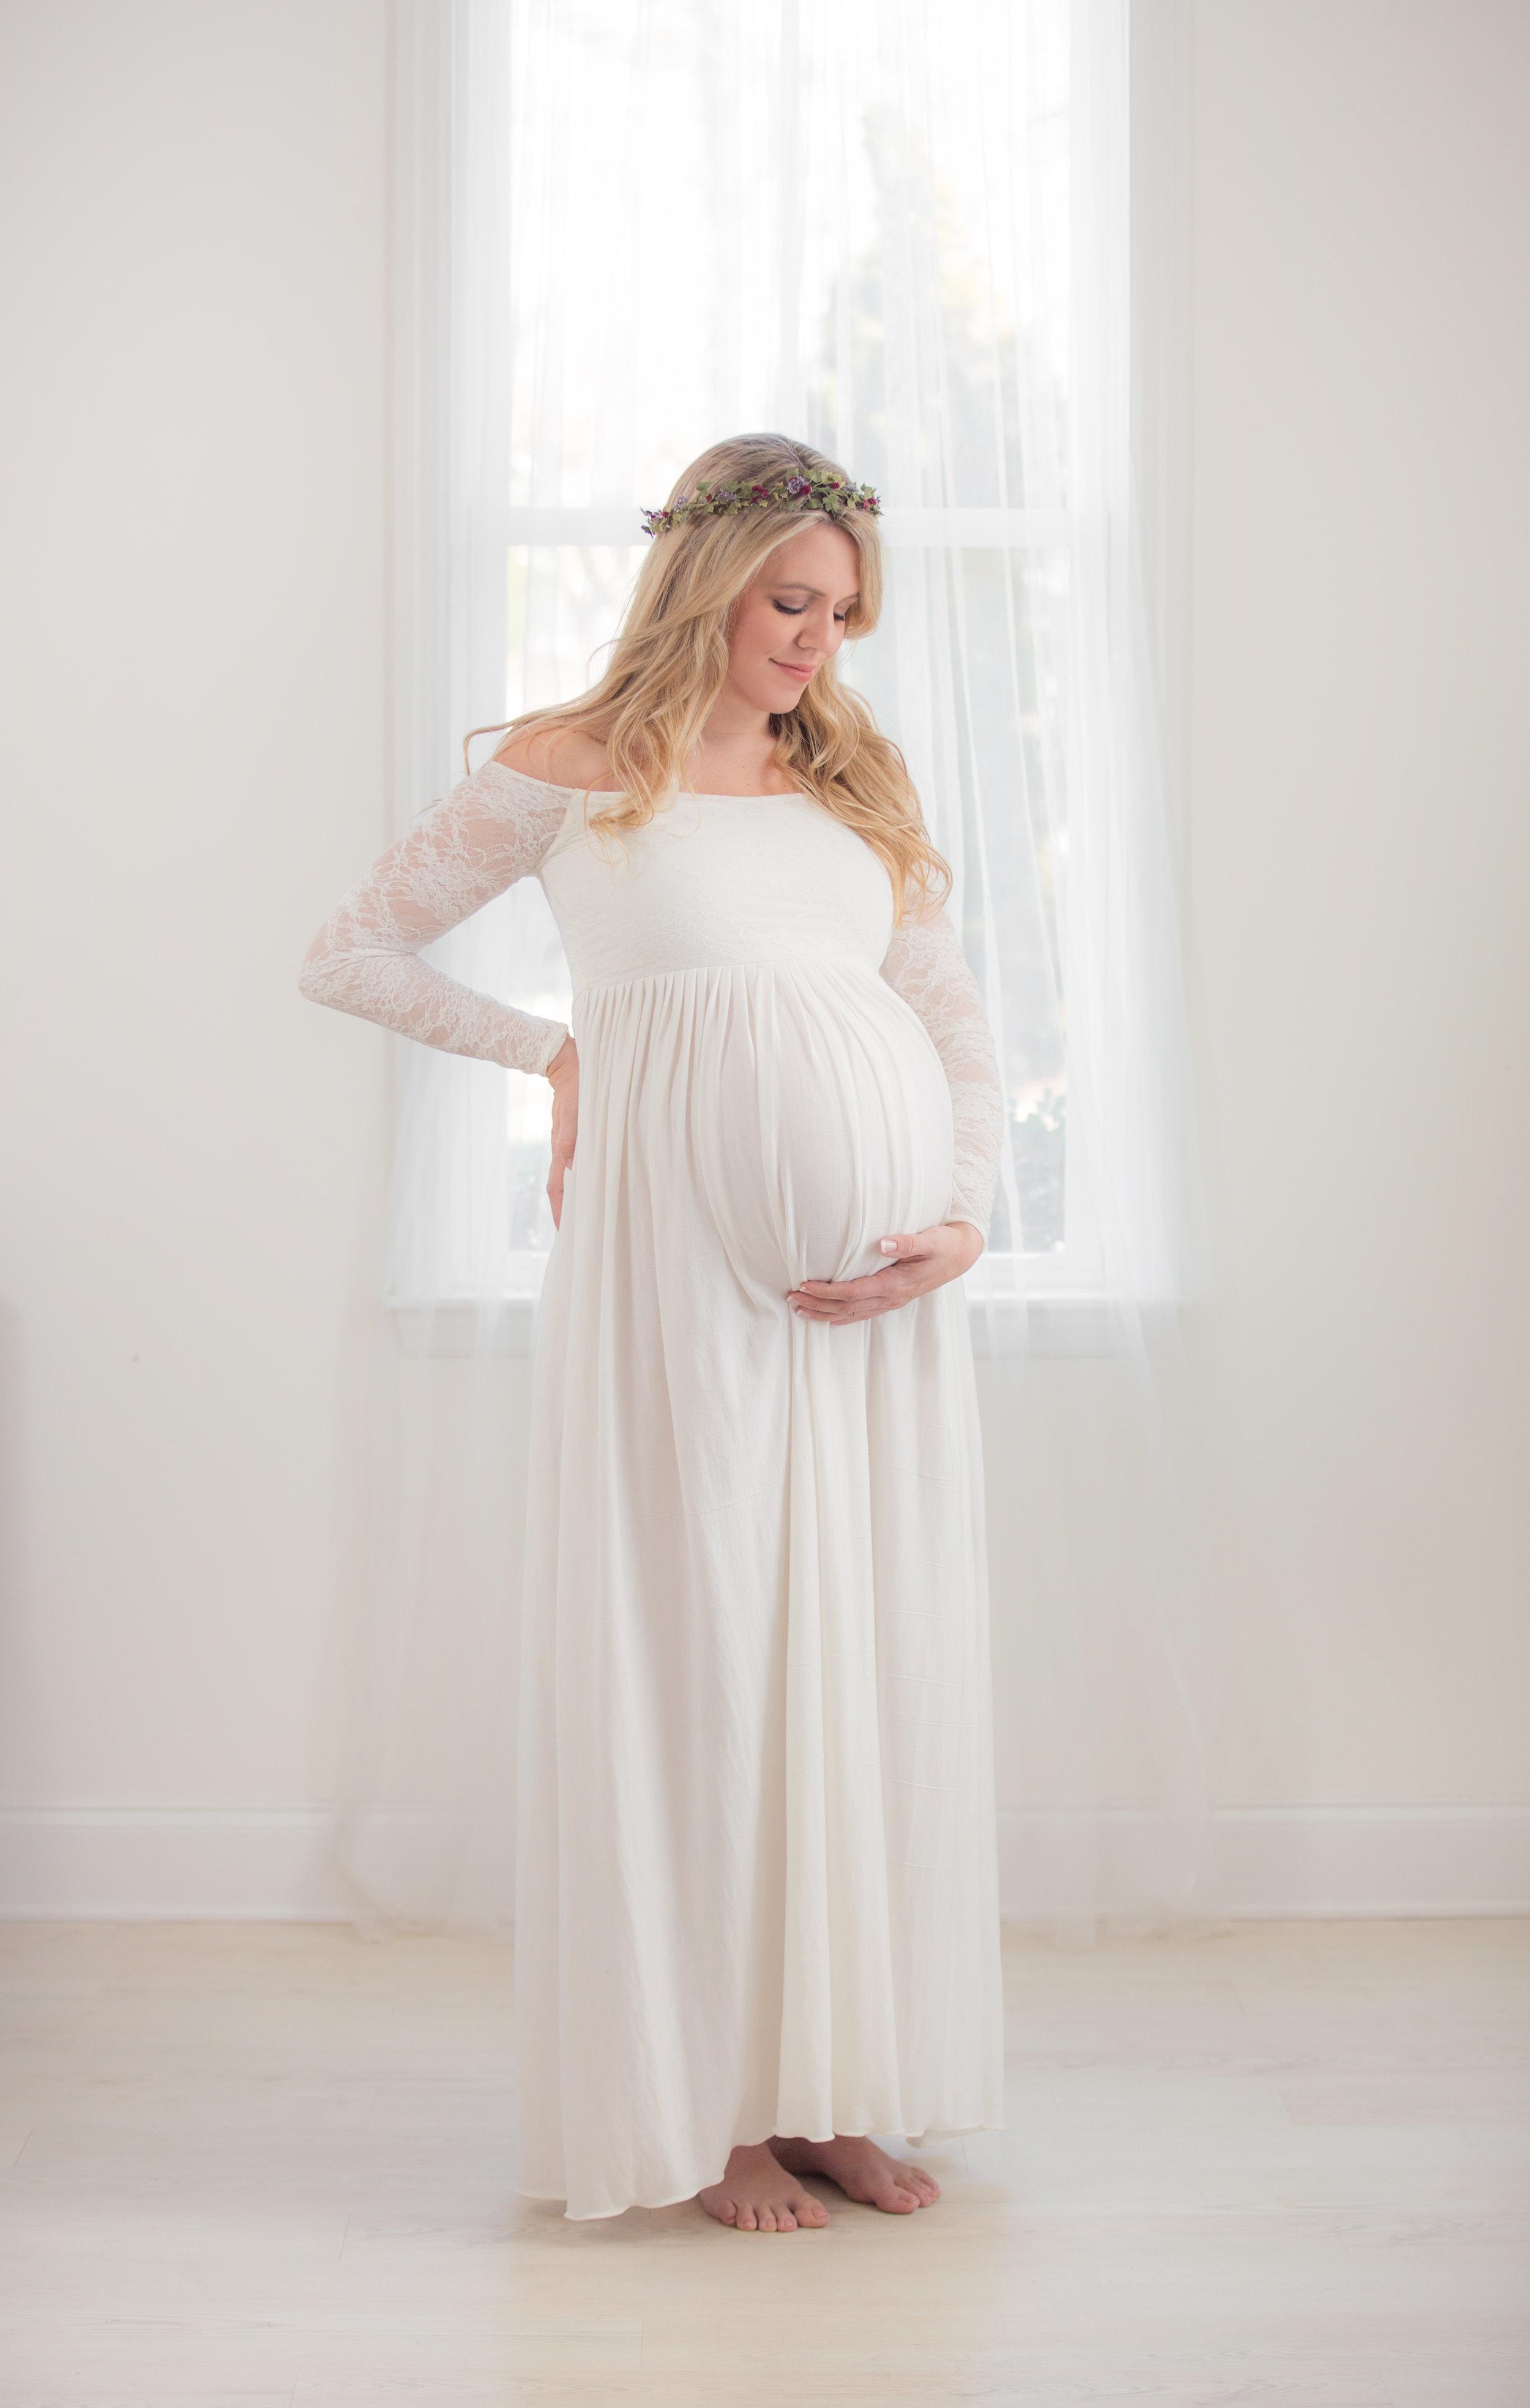 0052_Cervino_Maternity_3I3A8554_RTCH.jpg